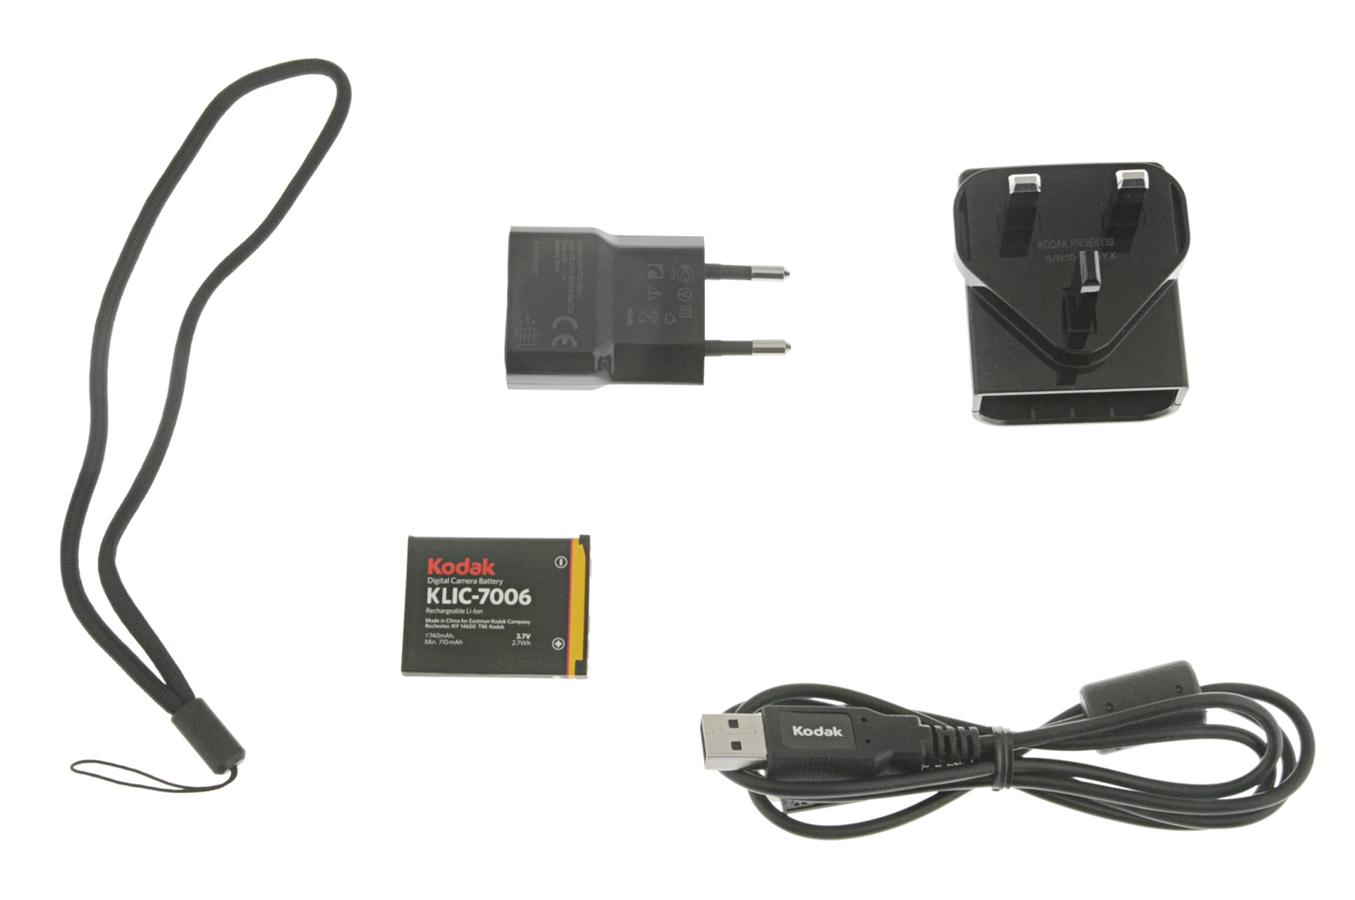 appareil photo compact kodak m522 noir 3441733 darty. Black Bedroom Furniture Sets. Home Design Ideas